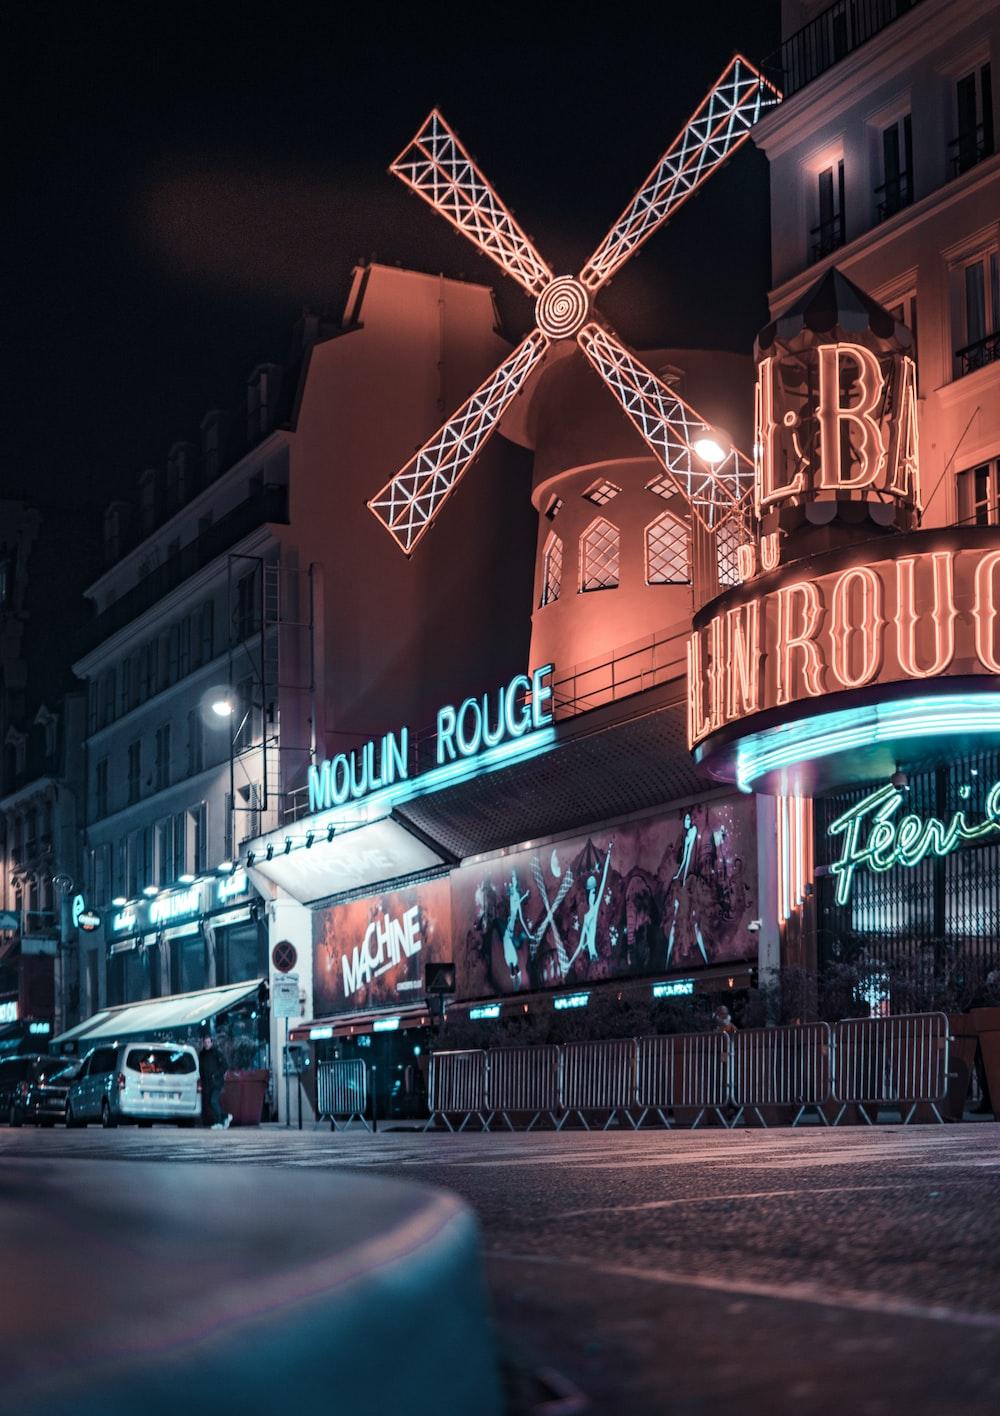 Moulin Rouge building